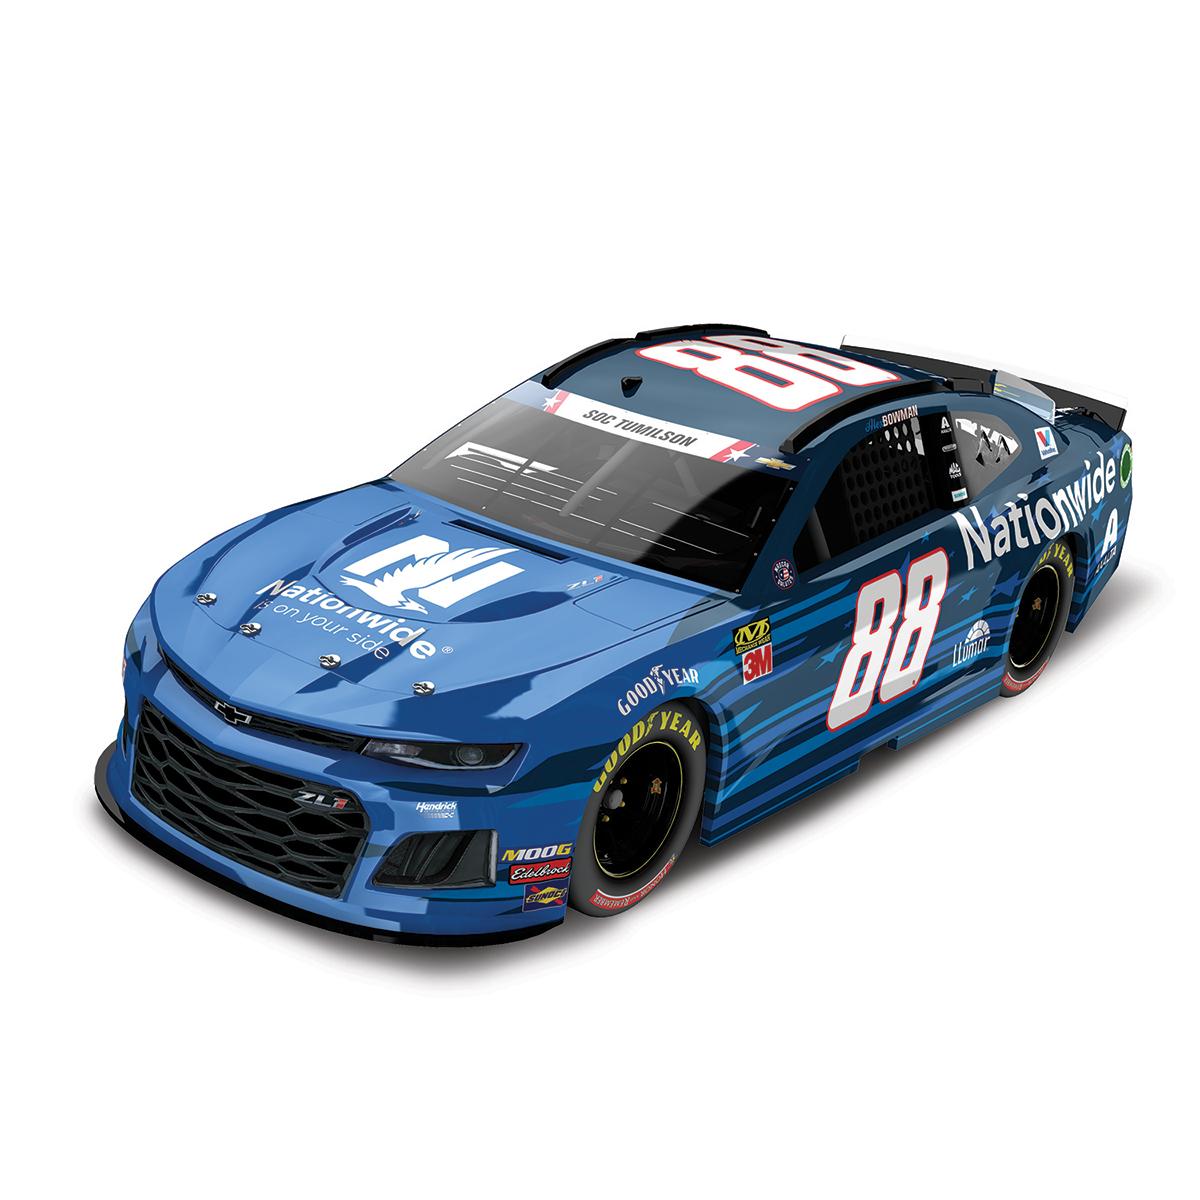 Alex Bowman 2019 #88 NASCAR Nationwide Patriotic HO 1:24 - Die Cast